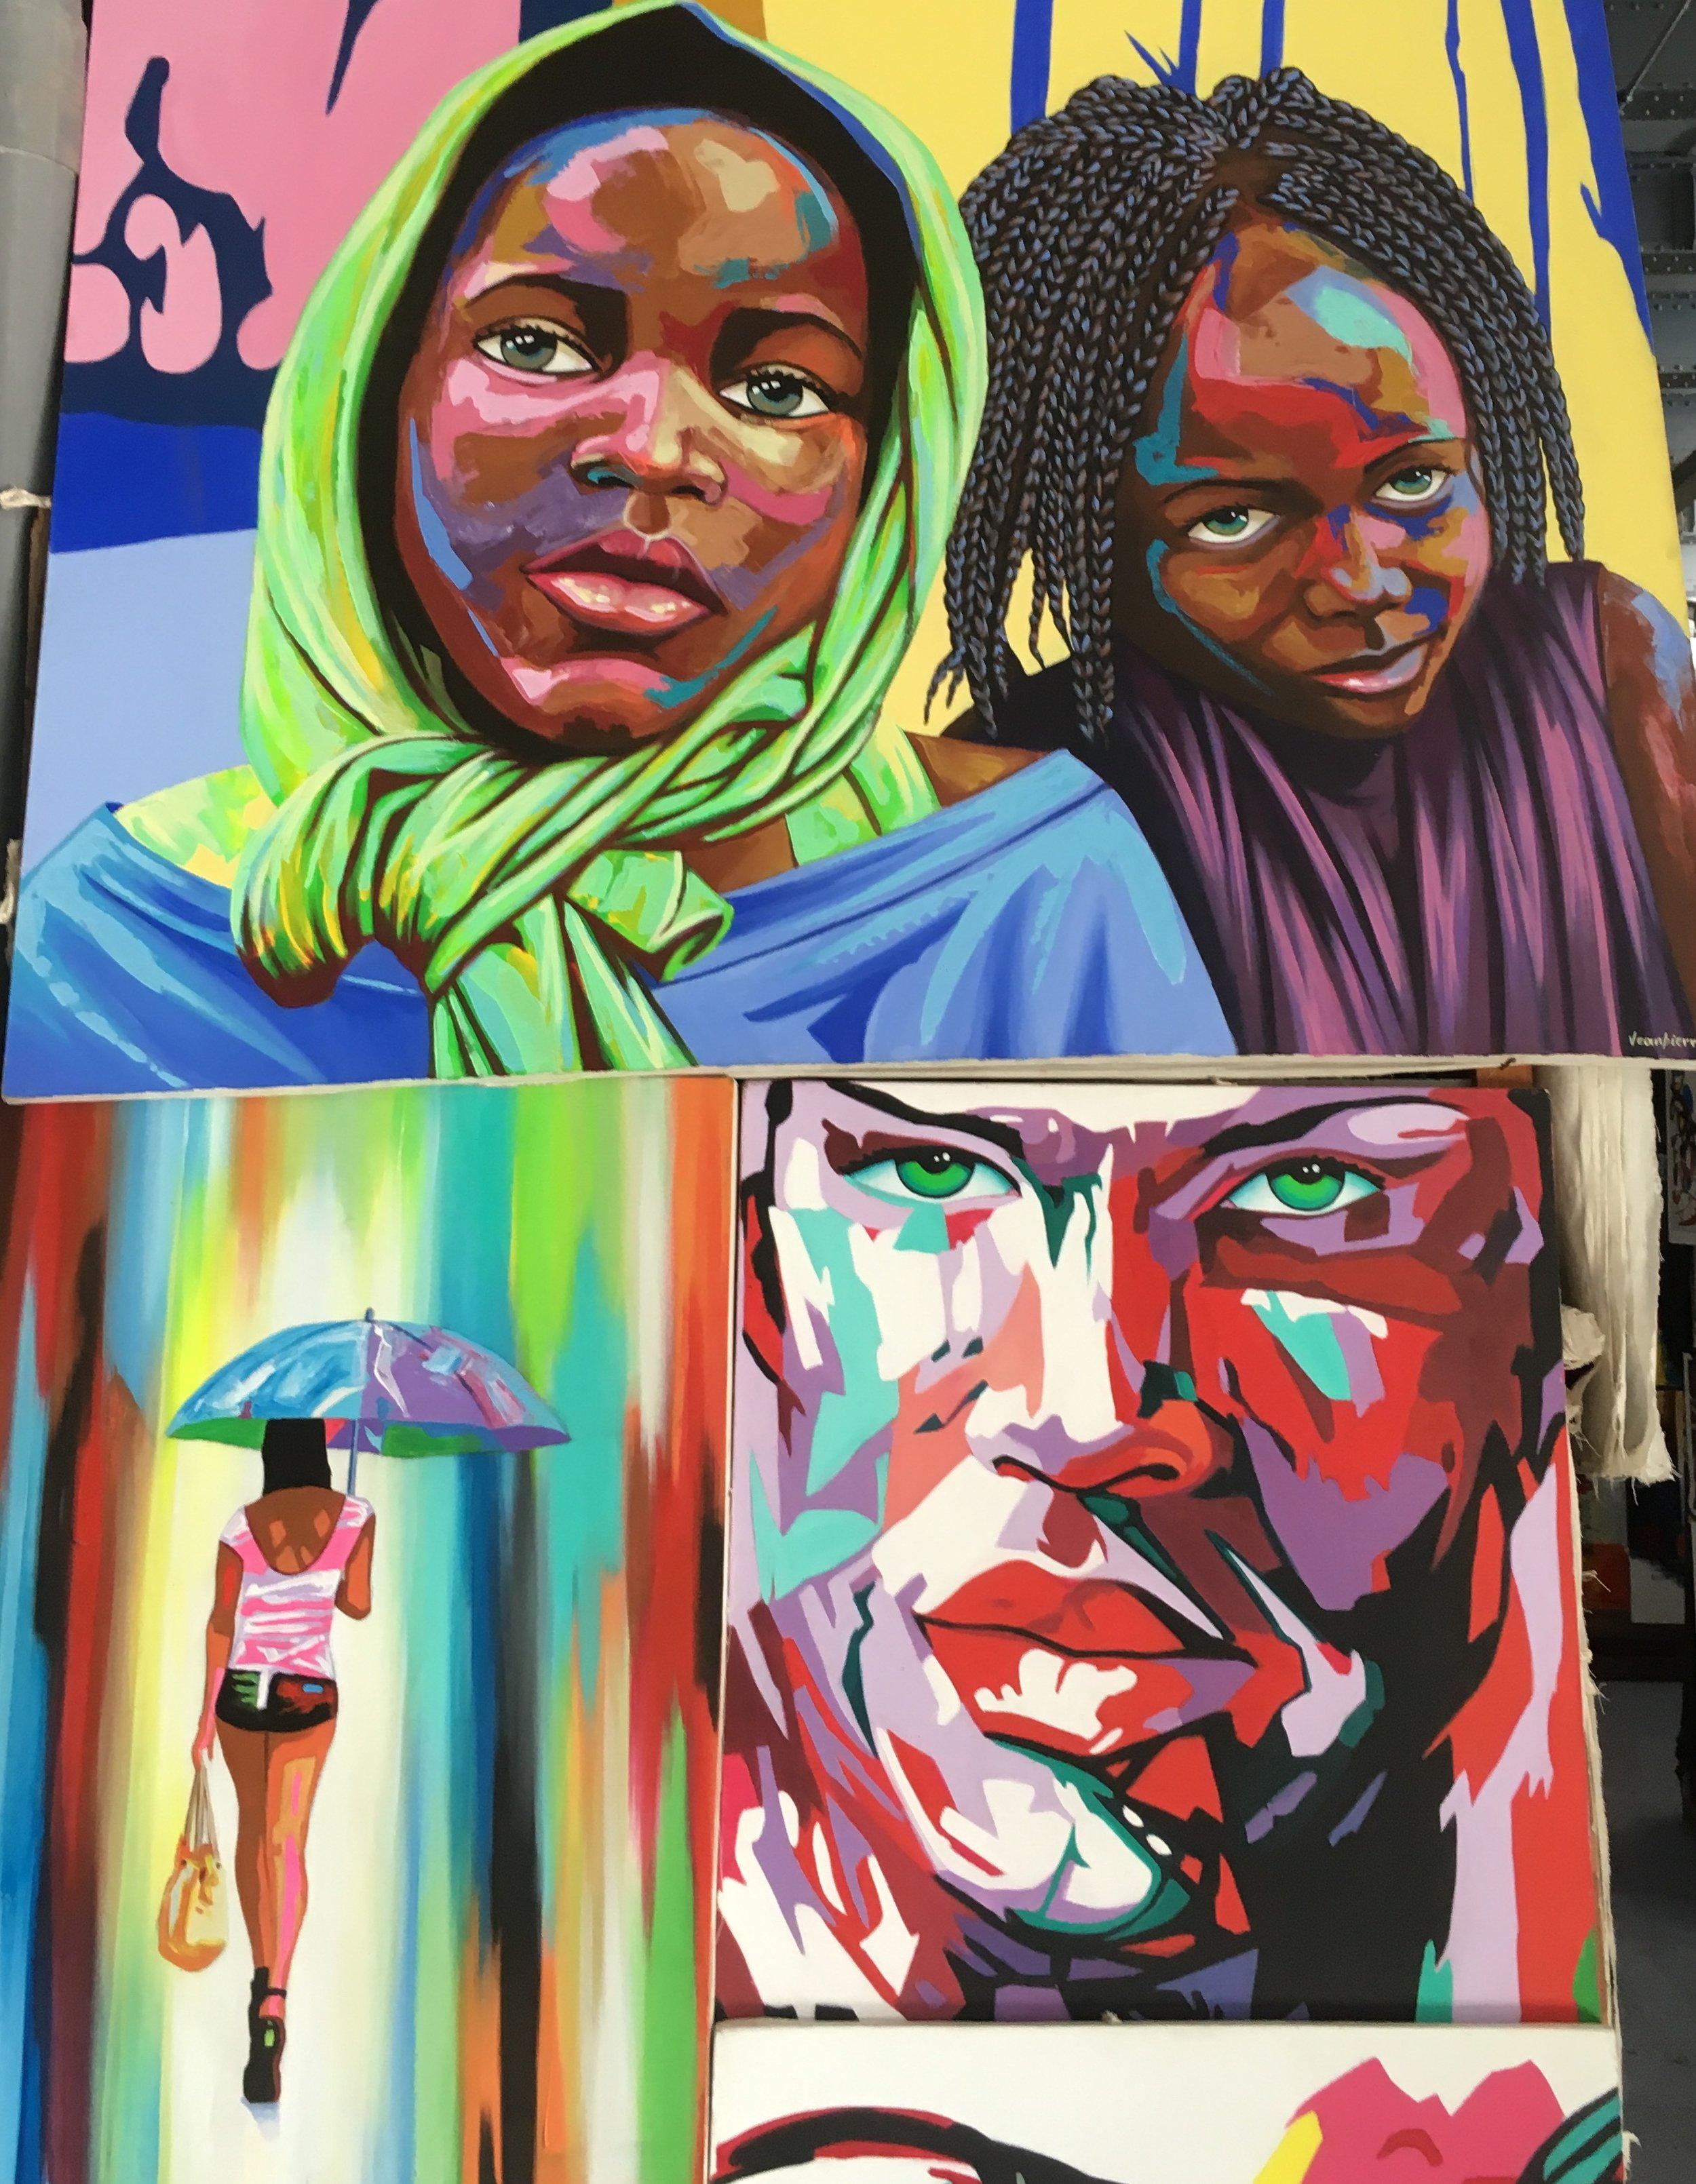 Cuban art. What colors!